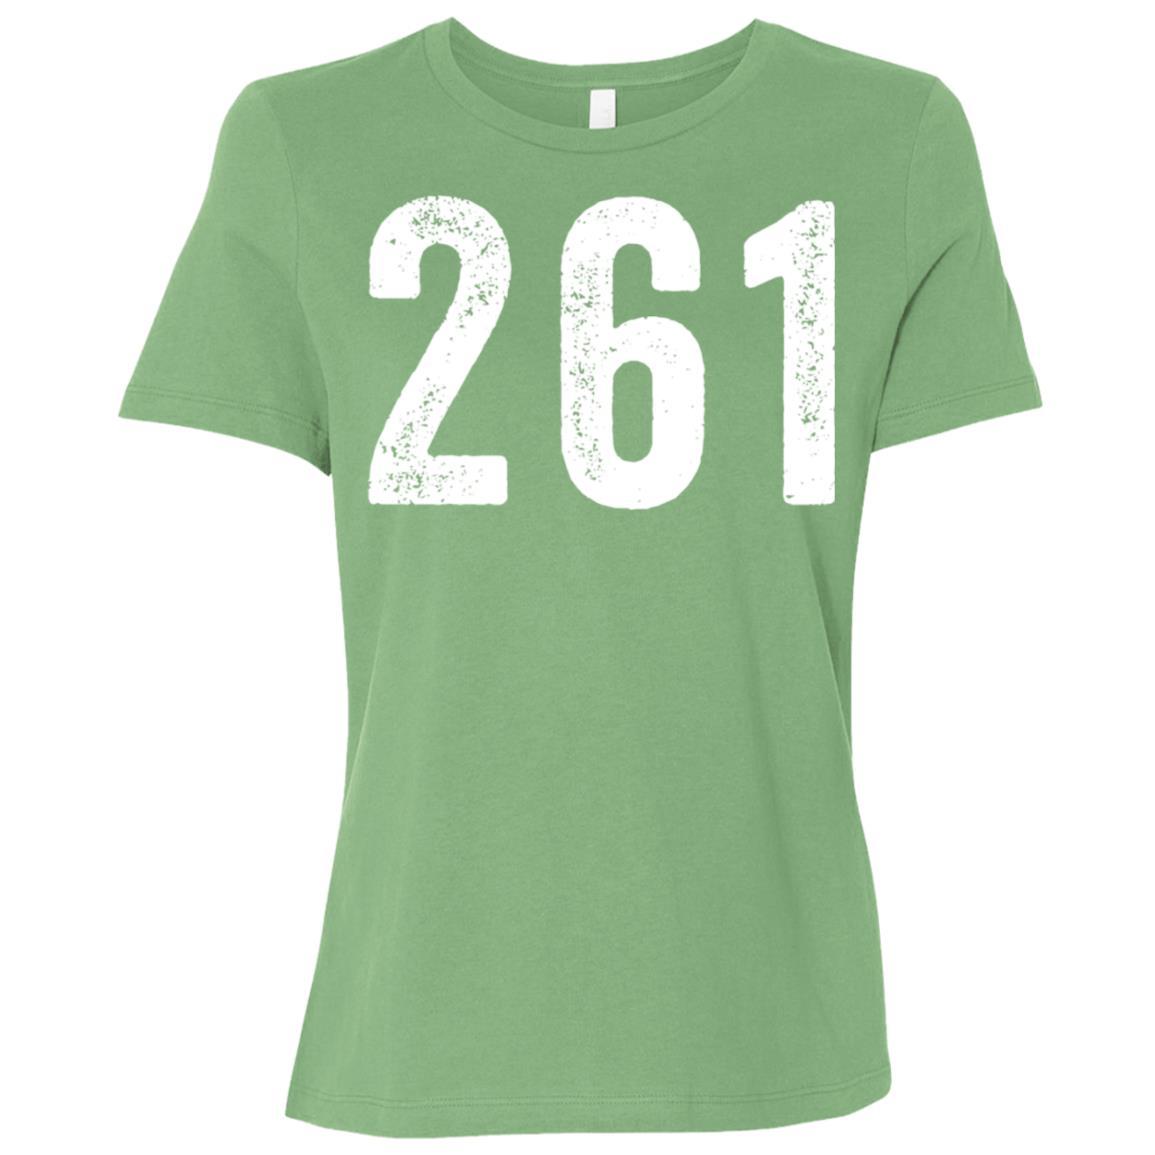 261 – Feminist Running Women Short Sleeve T-Shirt